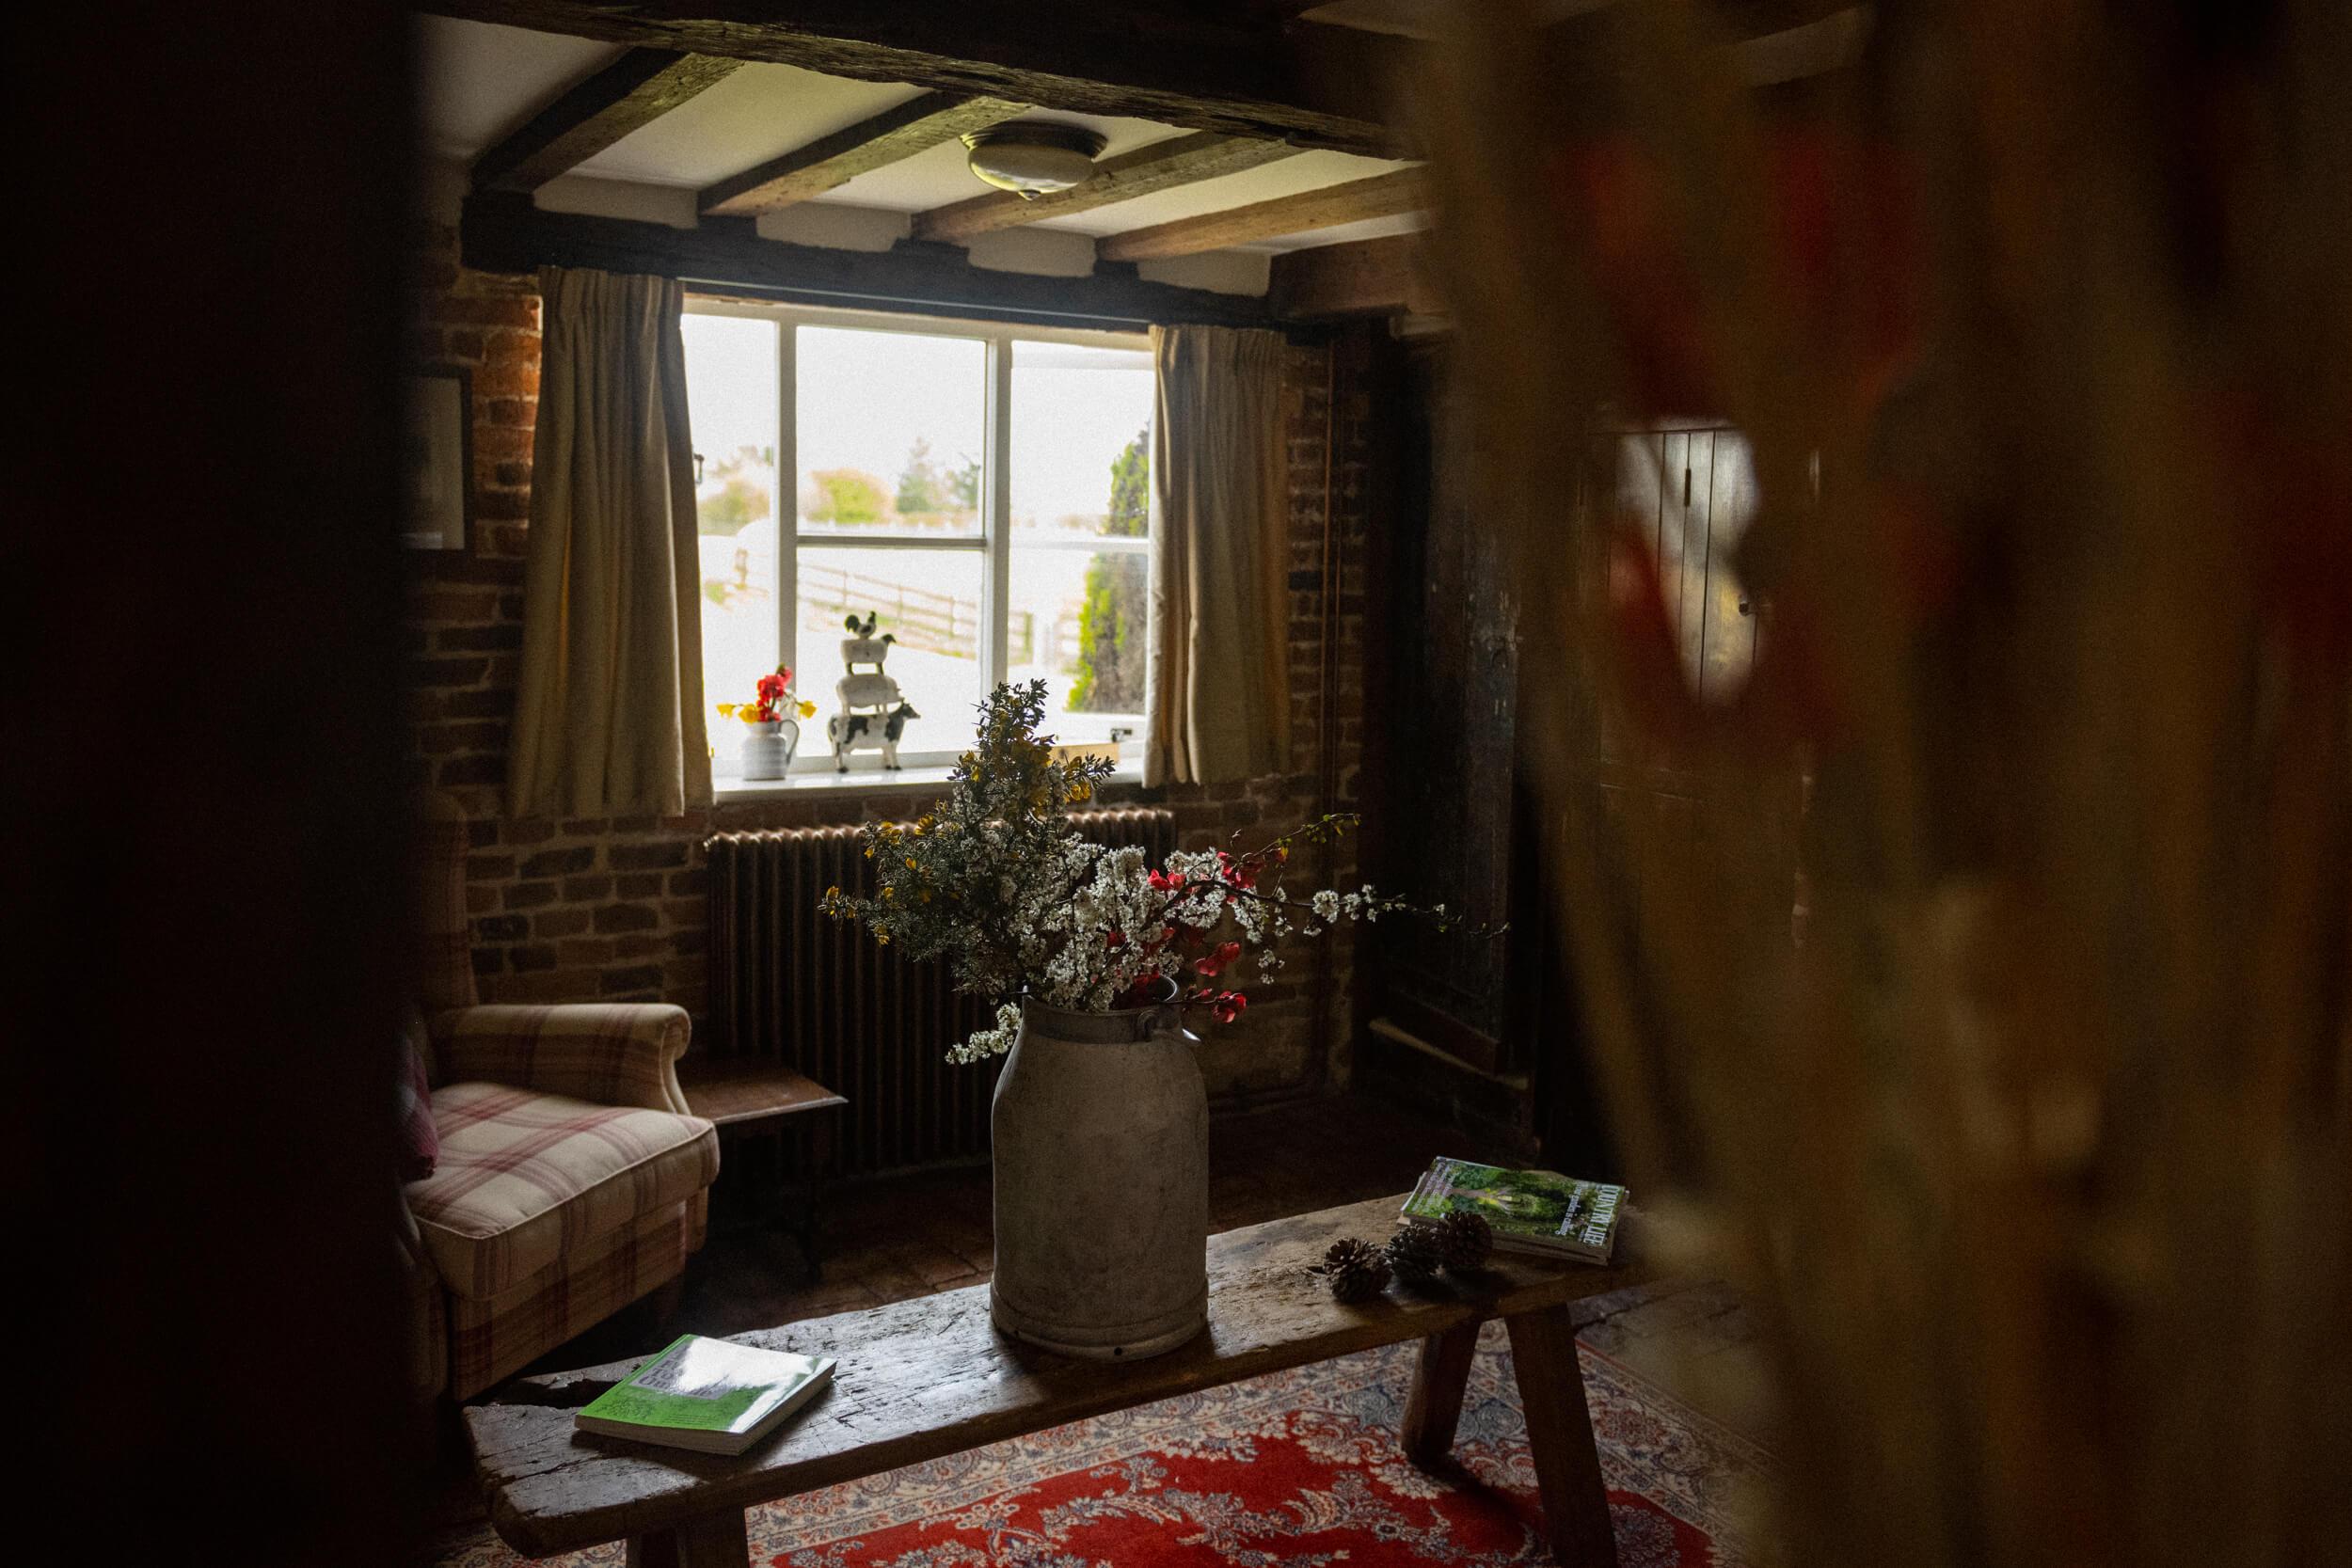 Through the door of the living room